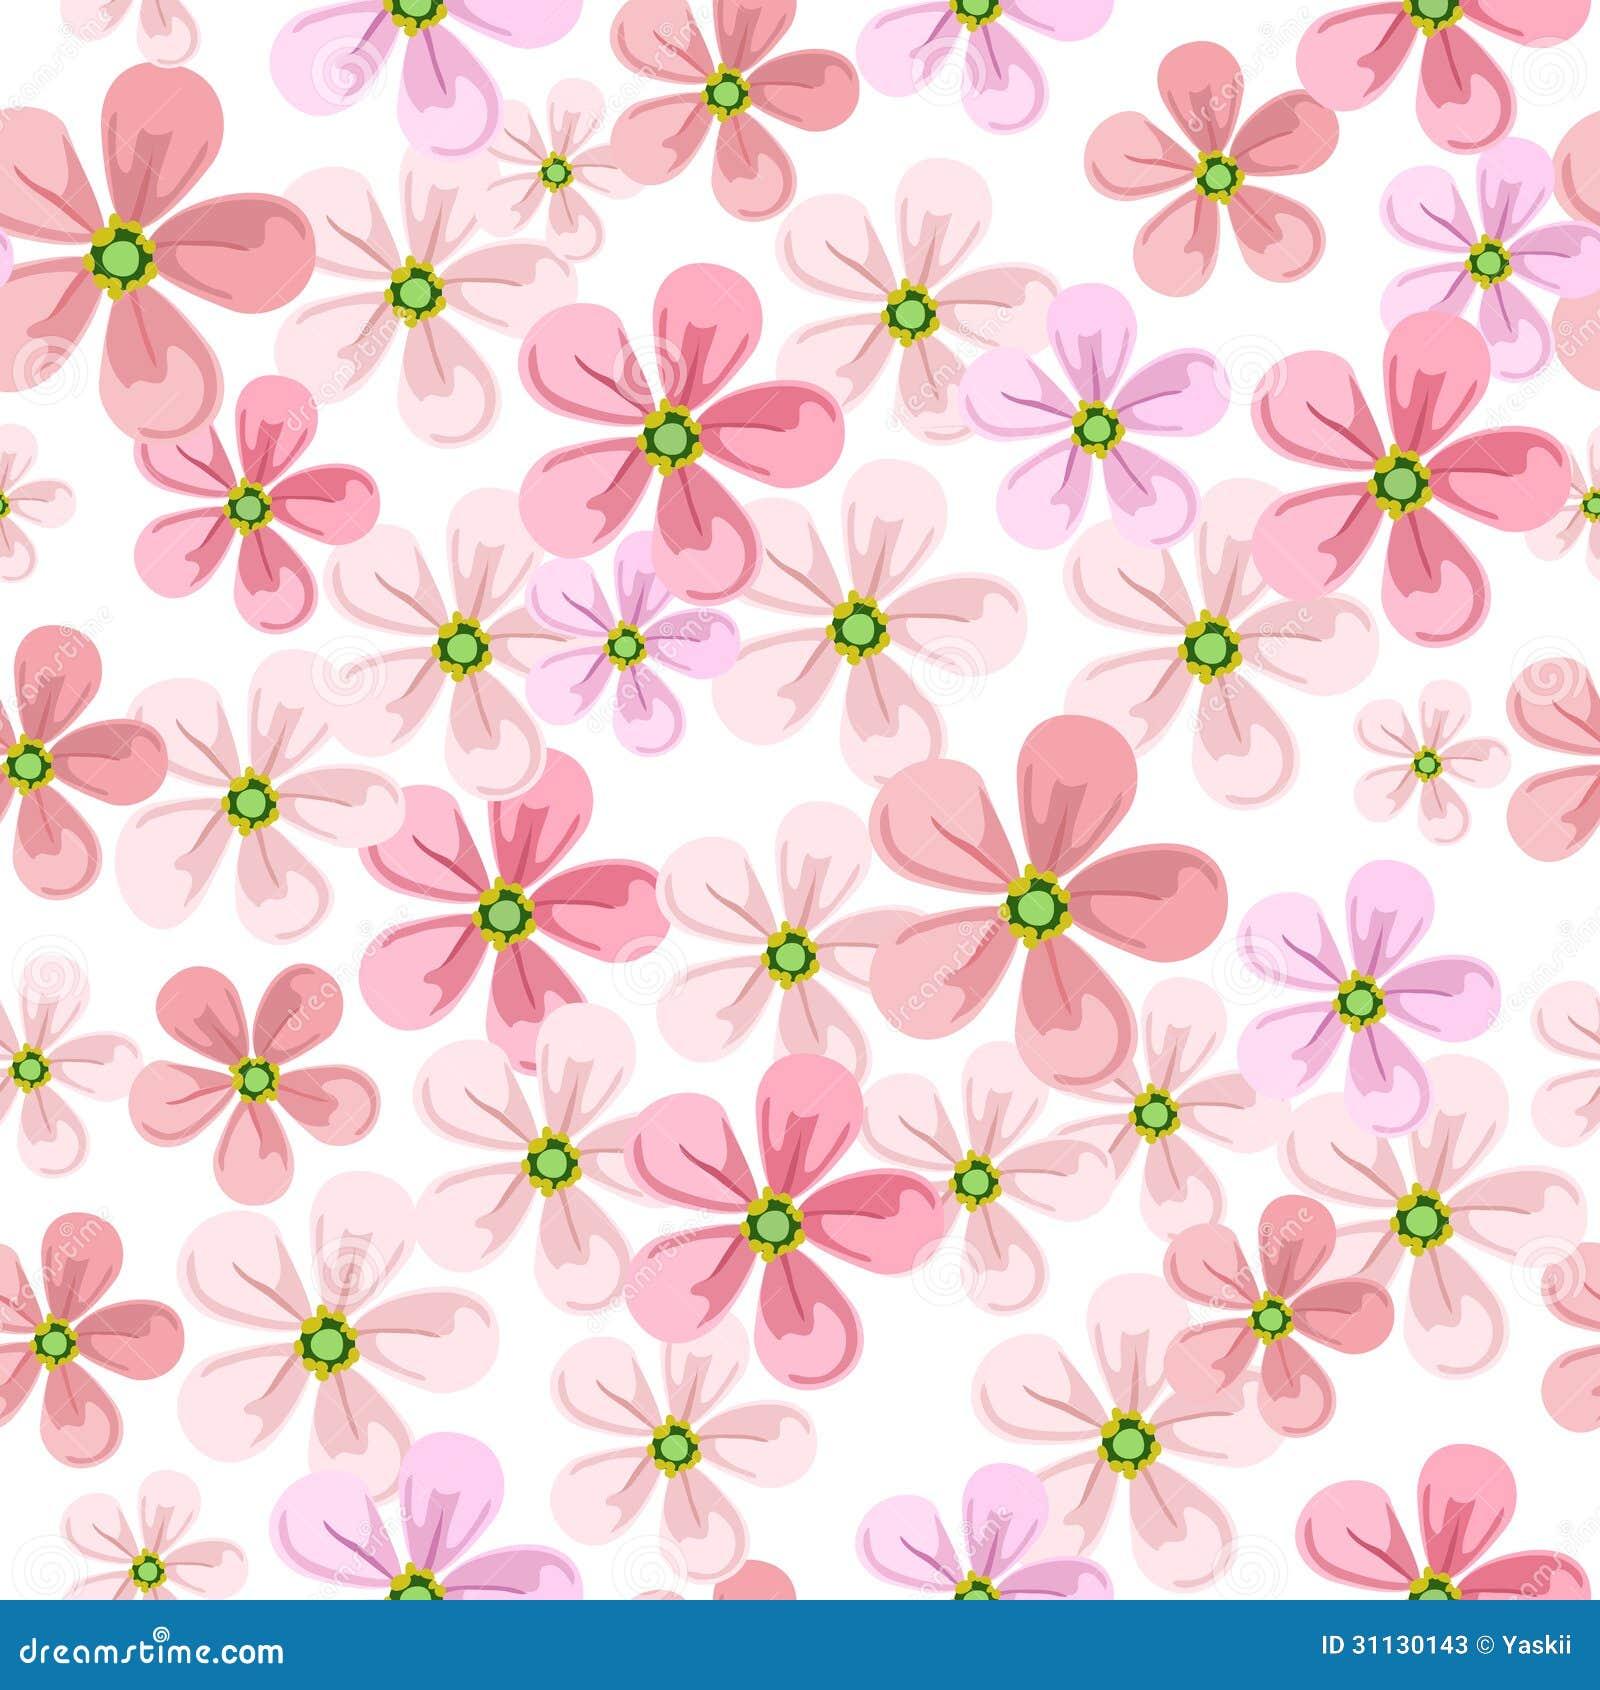 Floral Pattern Stock Vector. Illustration Of Flower